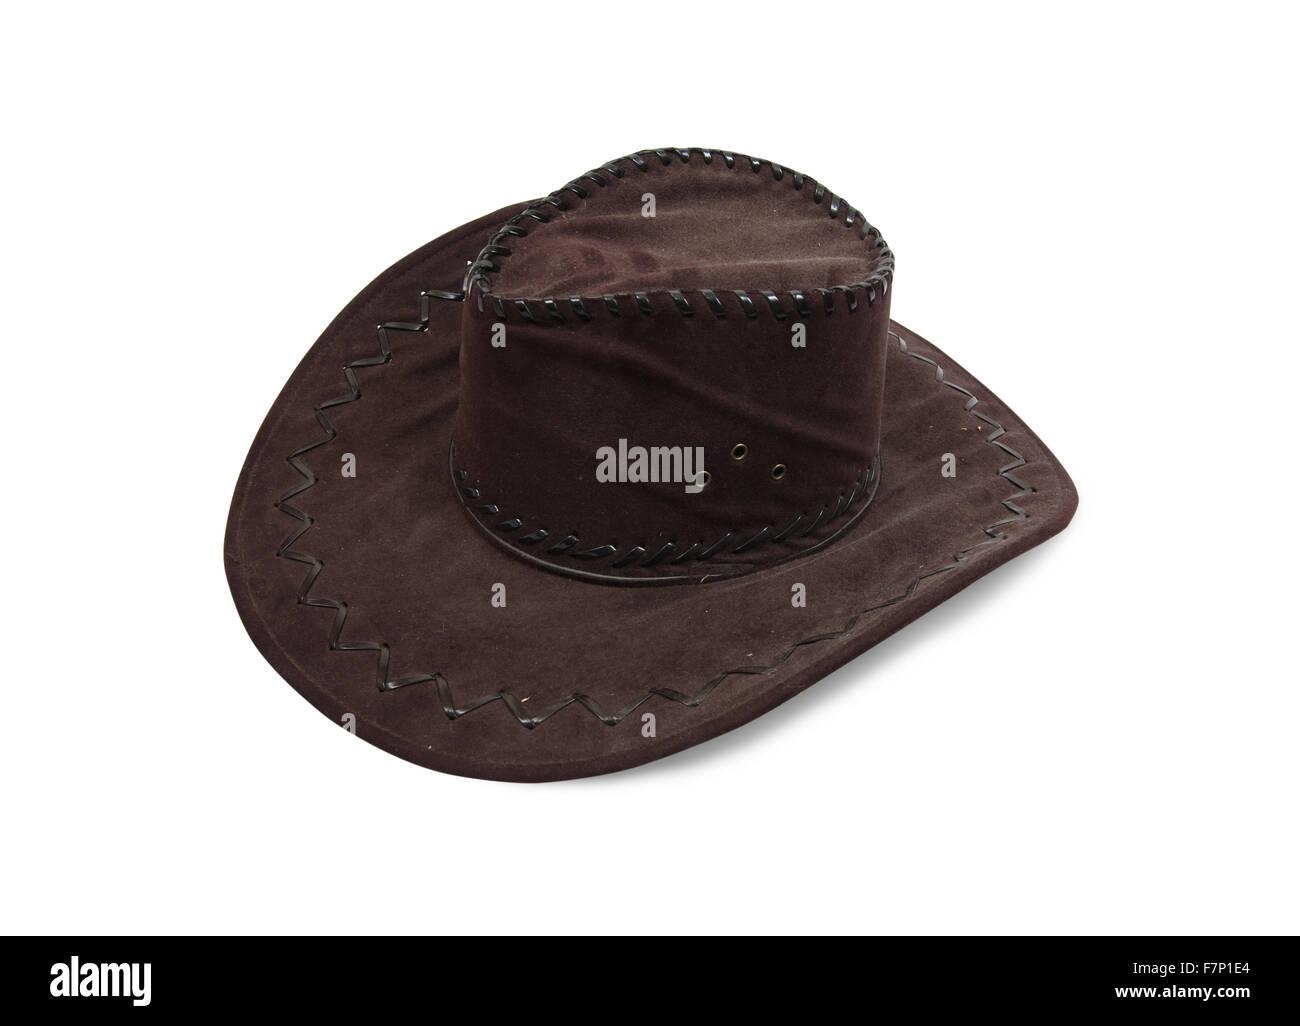 8194135168504 leather cowboy hat